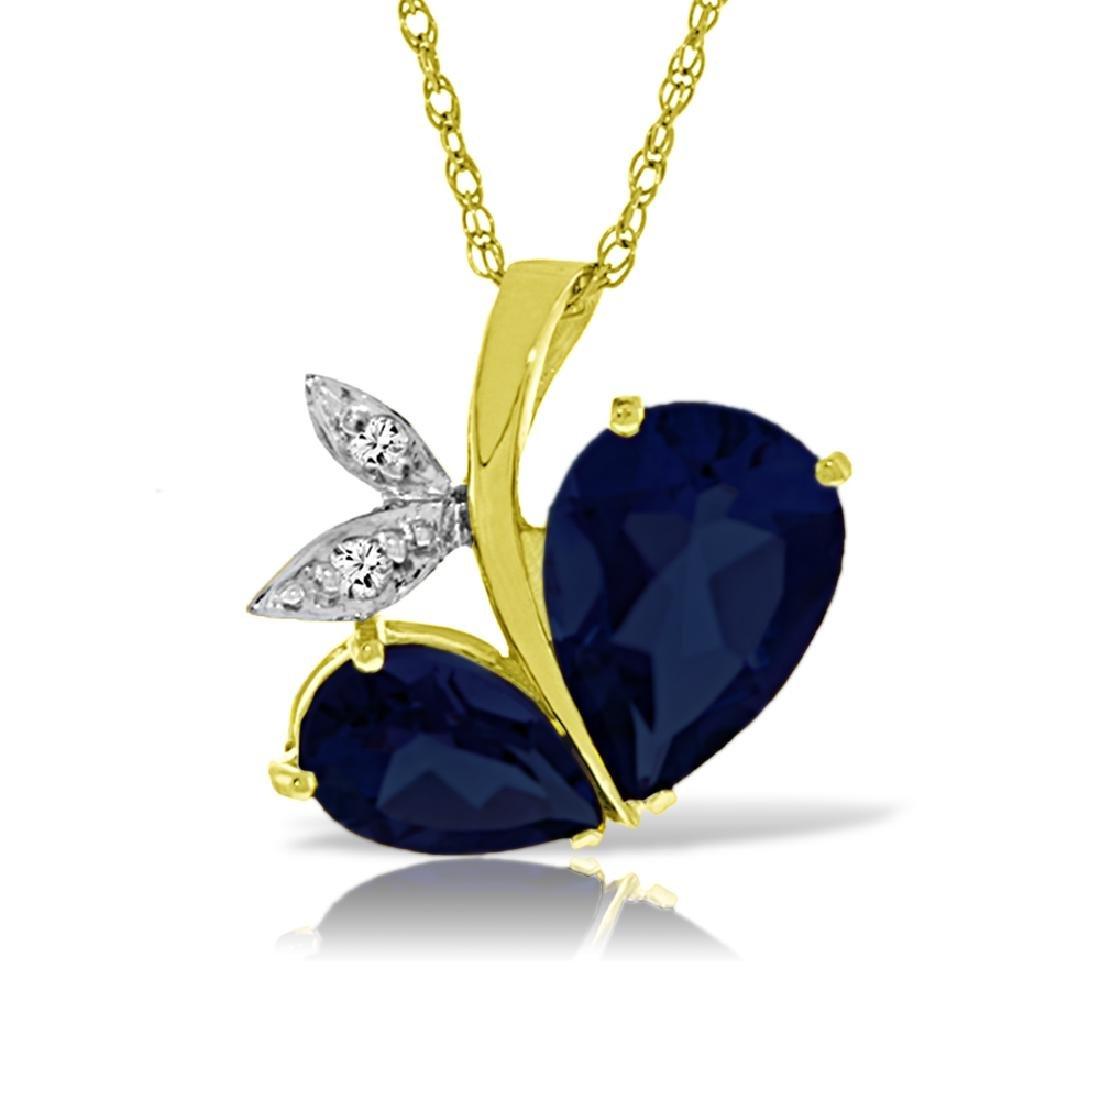 Genuine 5.36 ctw Sapphire & Diamond Necklace Jewelry